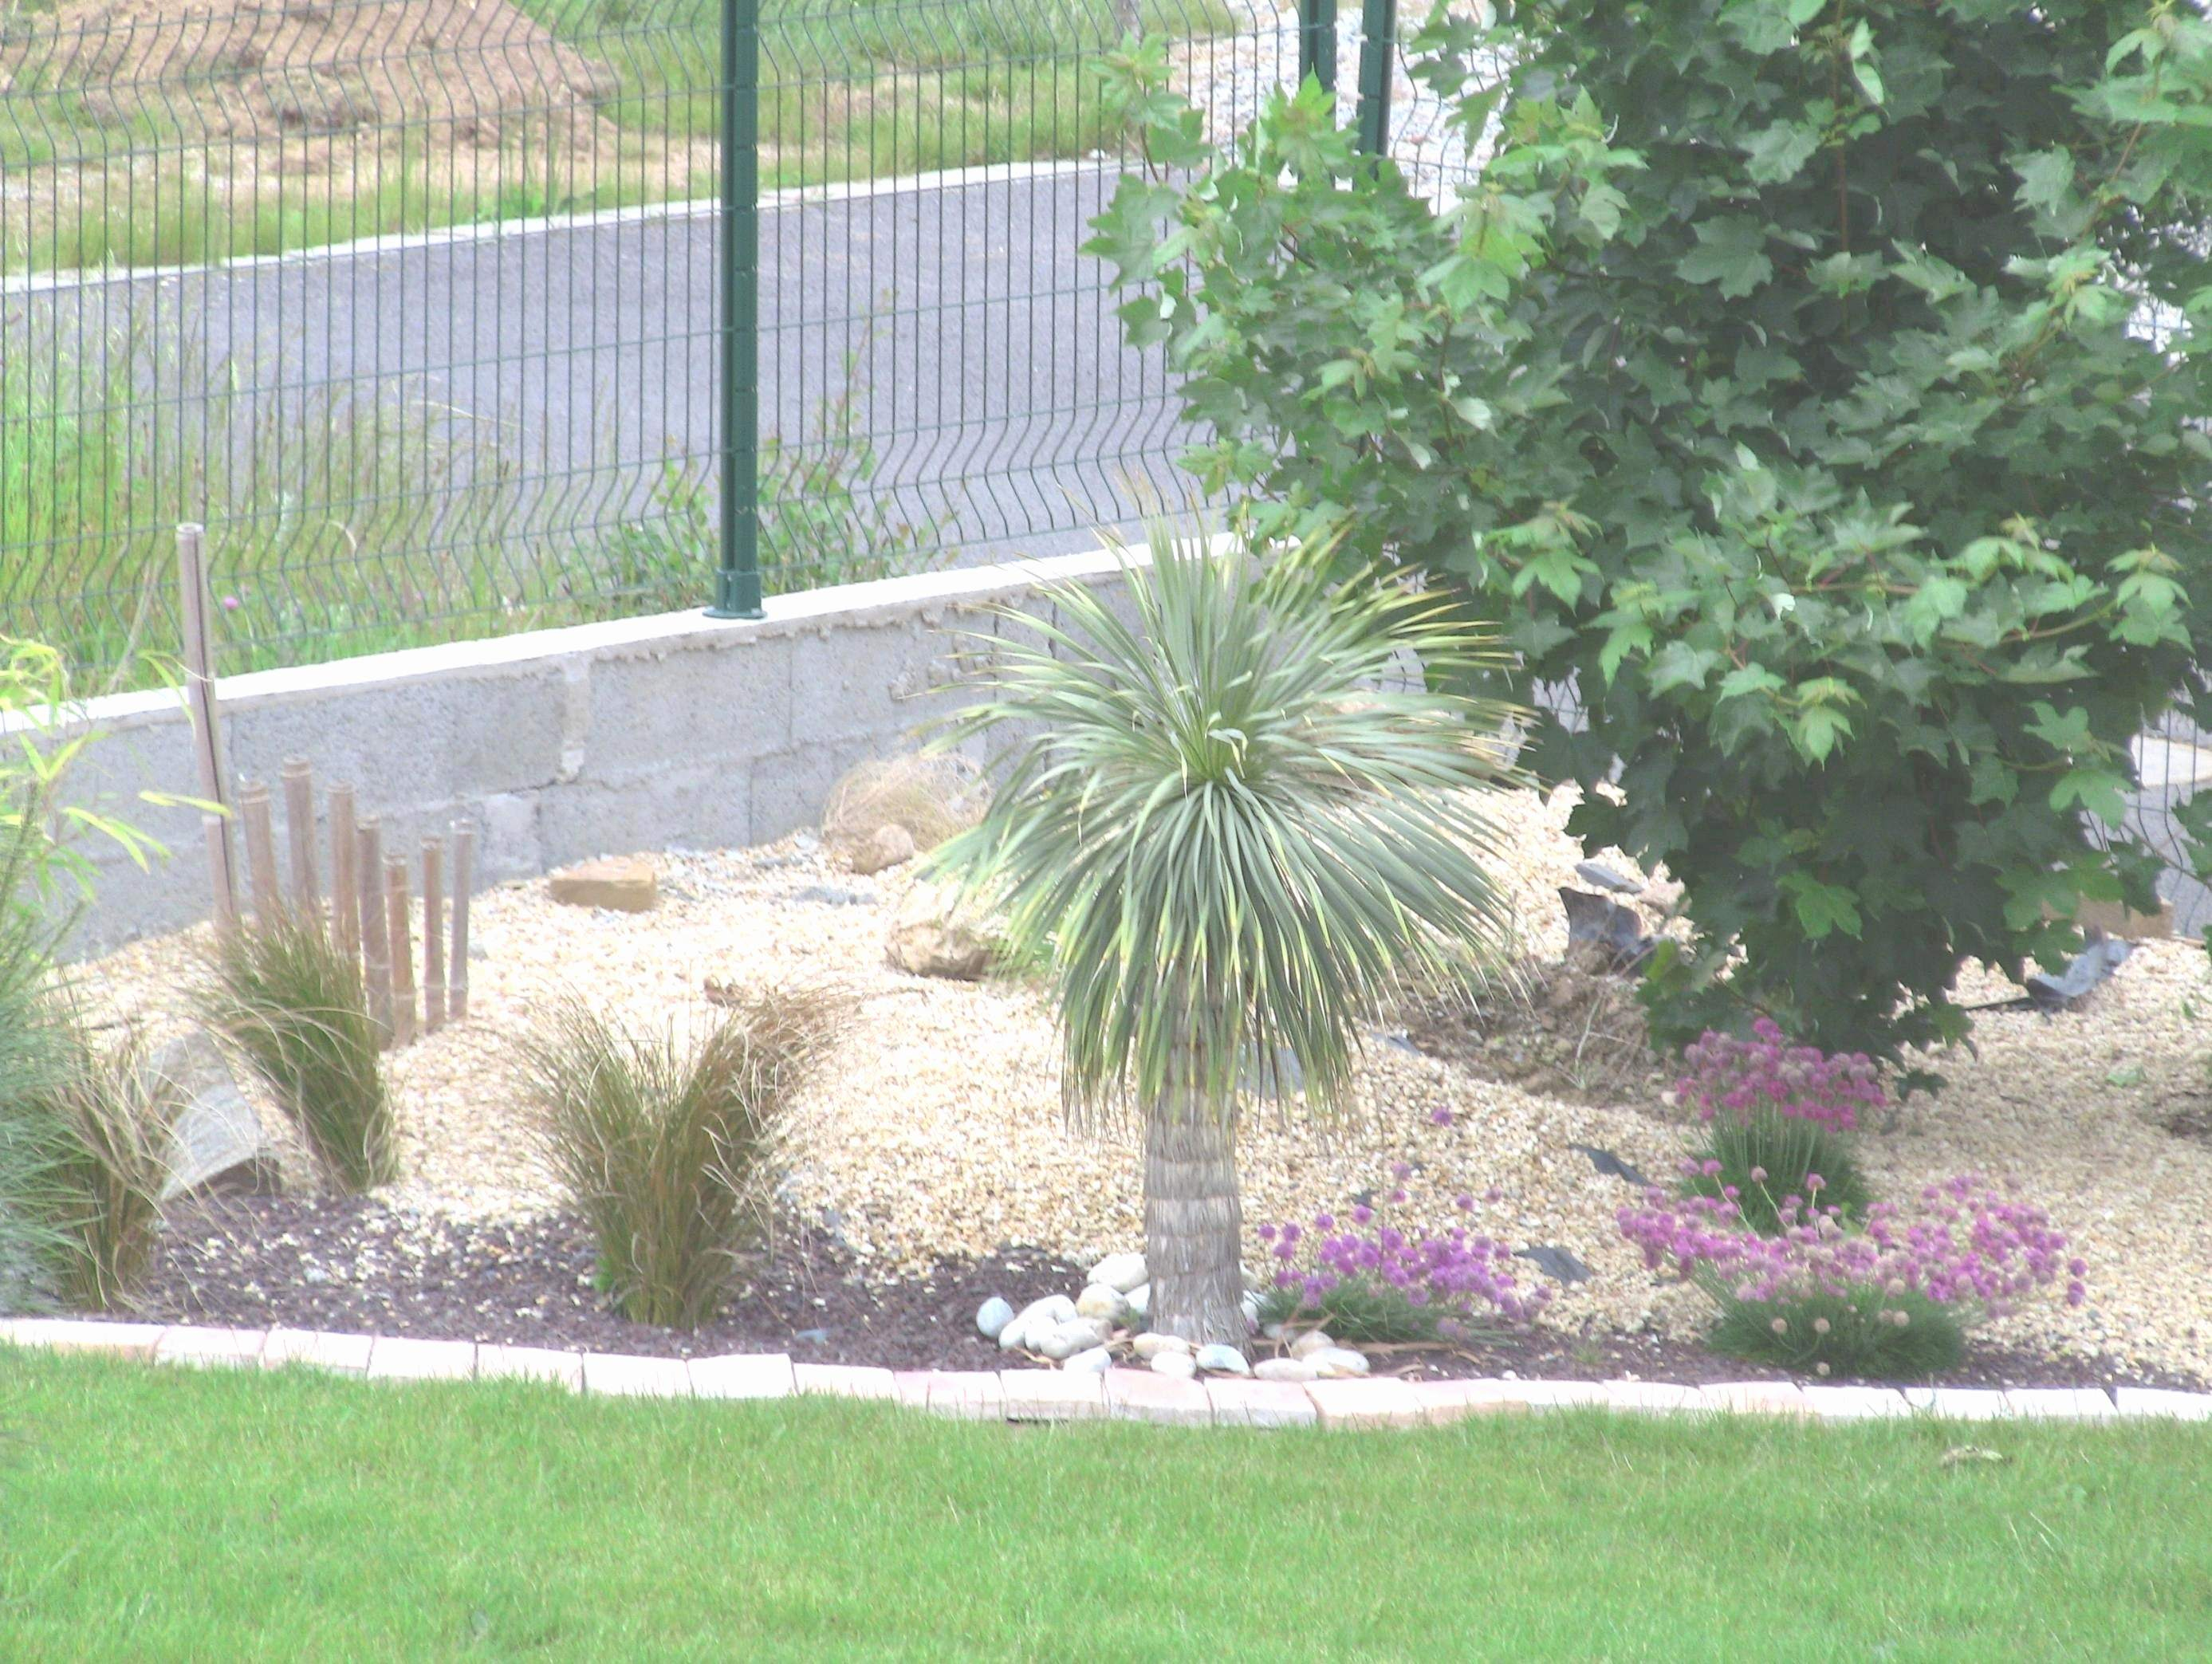 Bordure Jardin Moderne Impressionnant Photographie Amenagement Jardin Moderne Bordure De Jardin En Pierre De Cool